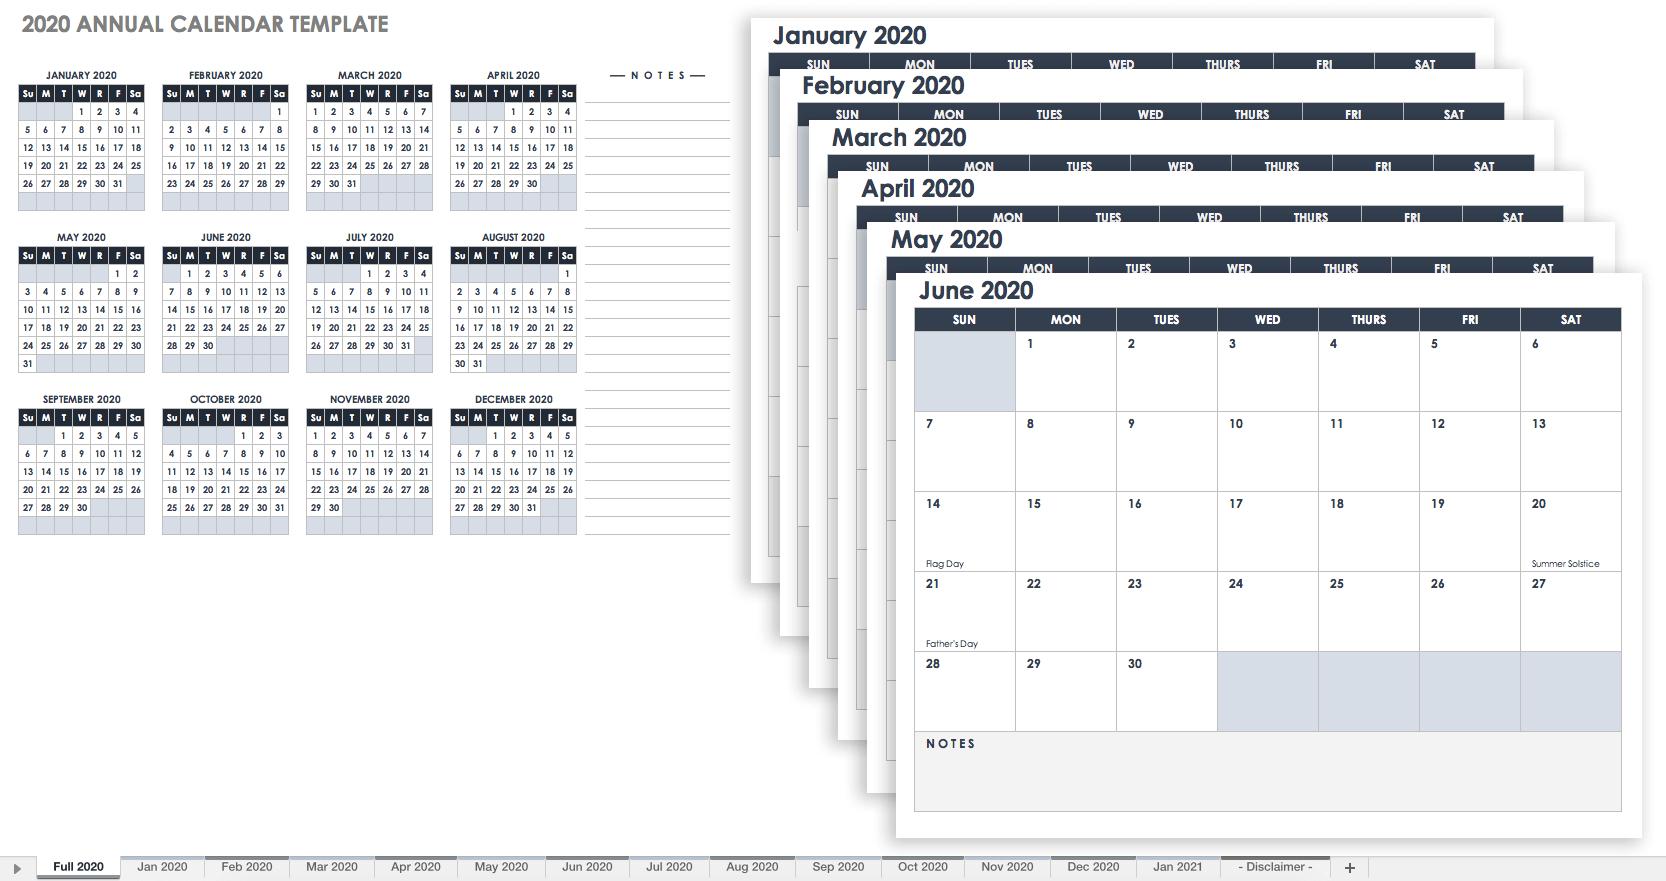 15 Free Monthly Calendar Templates | Smartsheet inside Free Printable 3 Month Calendar Template